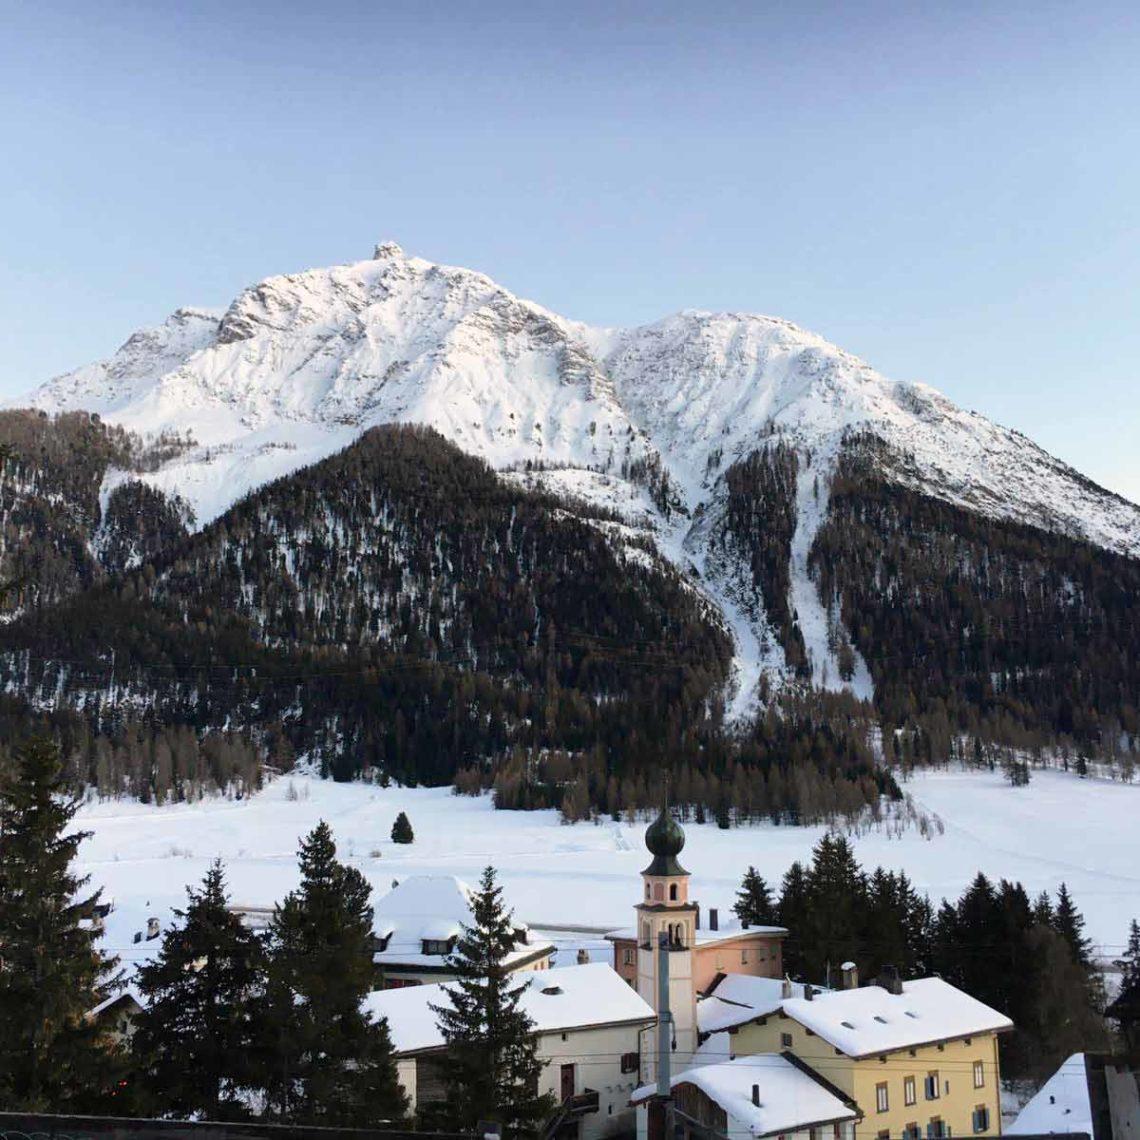 The Swiss Alps in Engadin, Switzerland